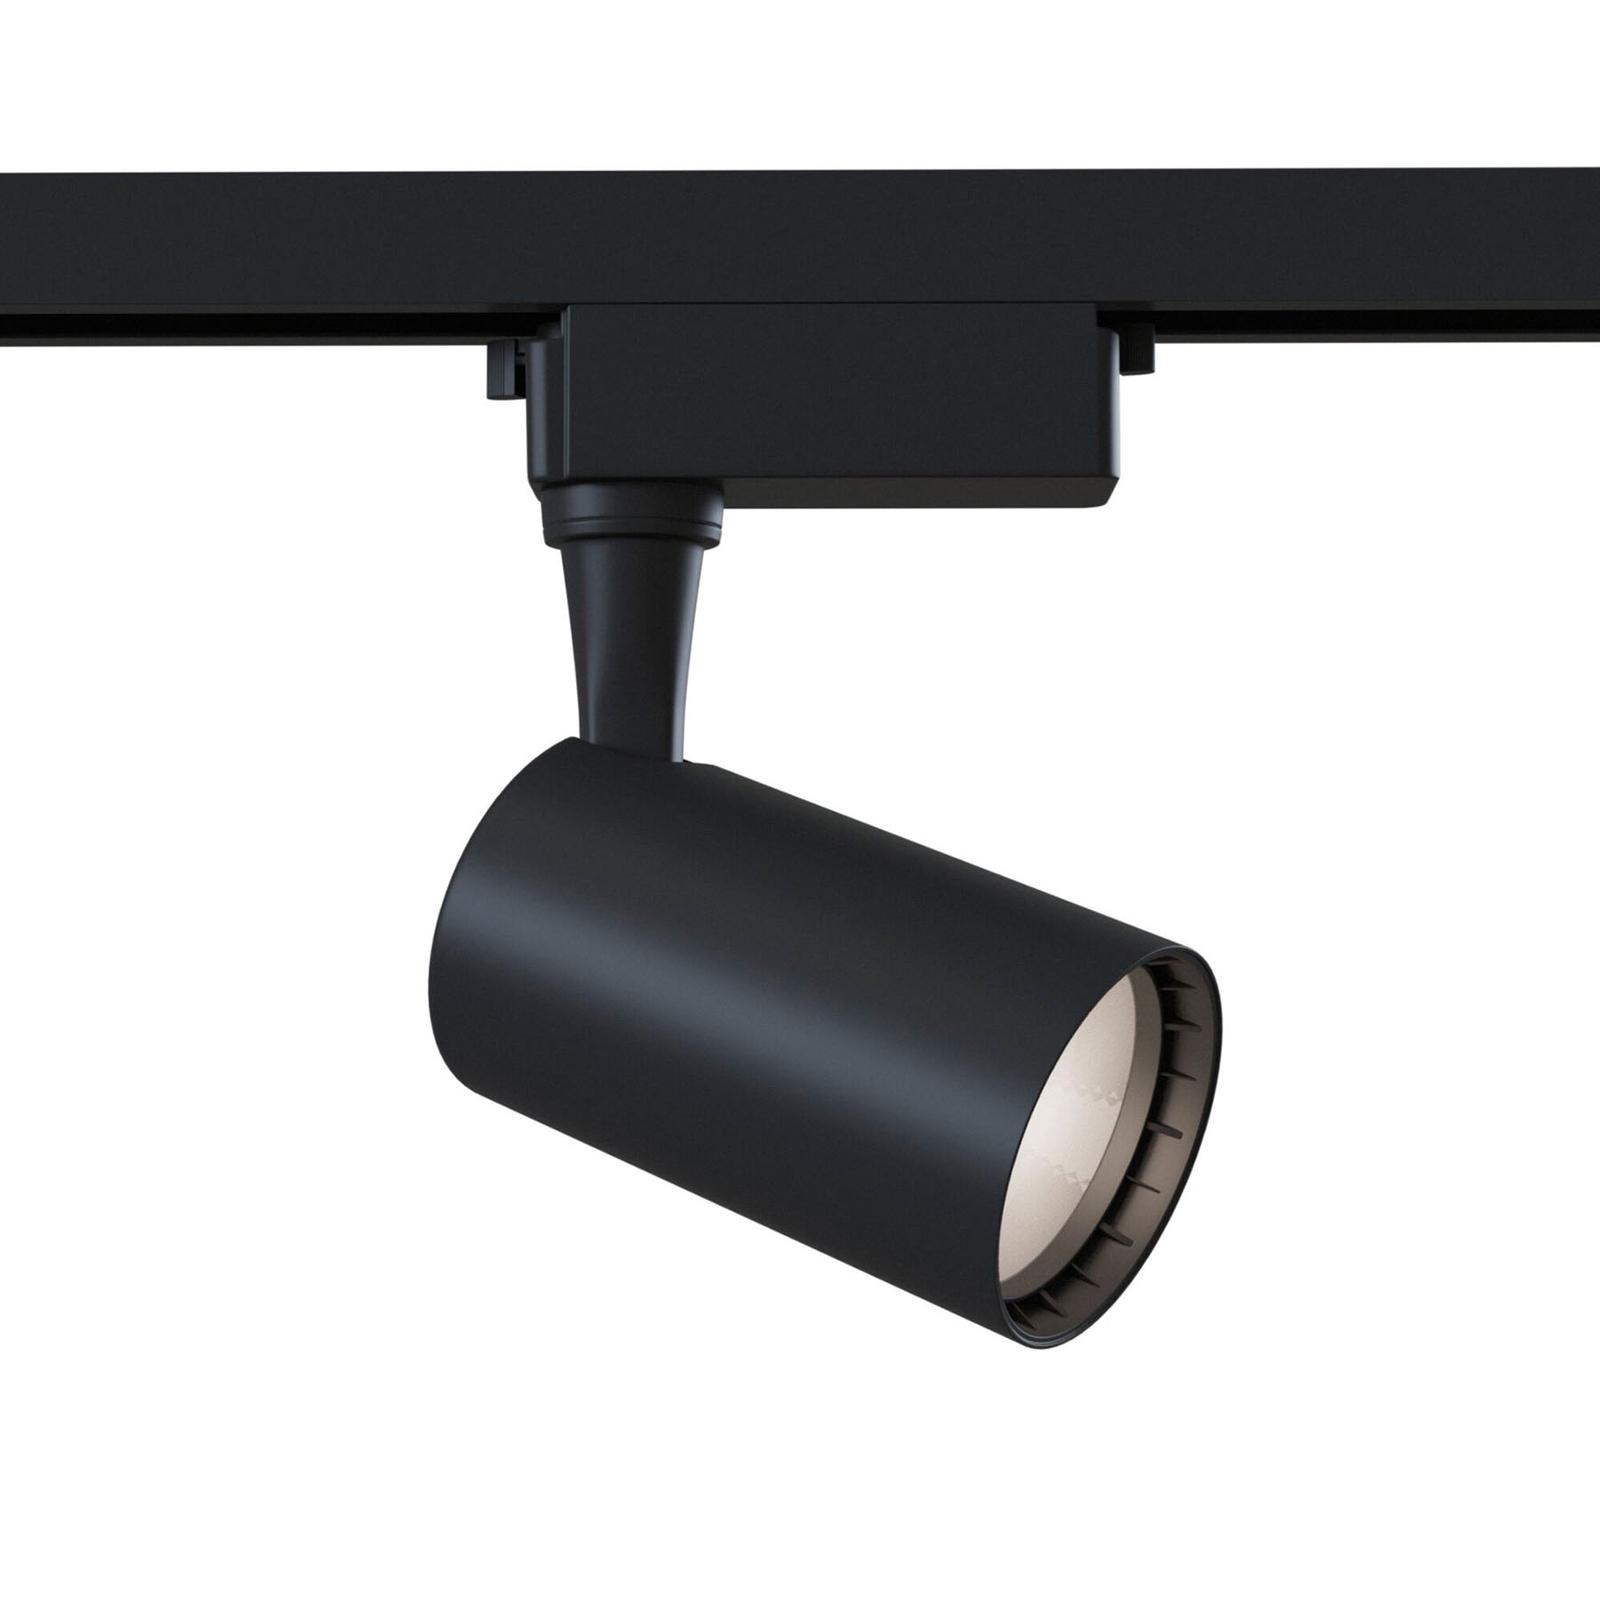 Track LED 1-fase-spot 3 000 K 6W, svart